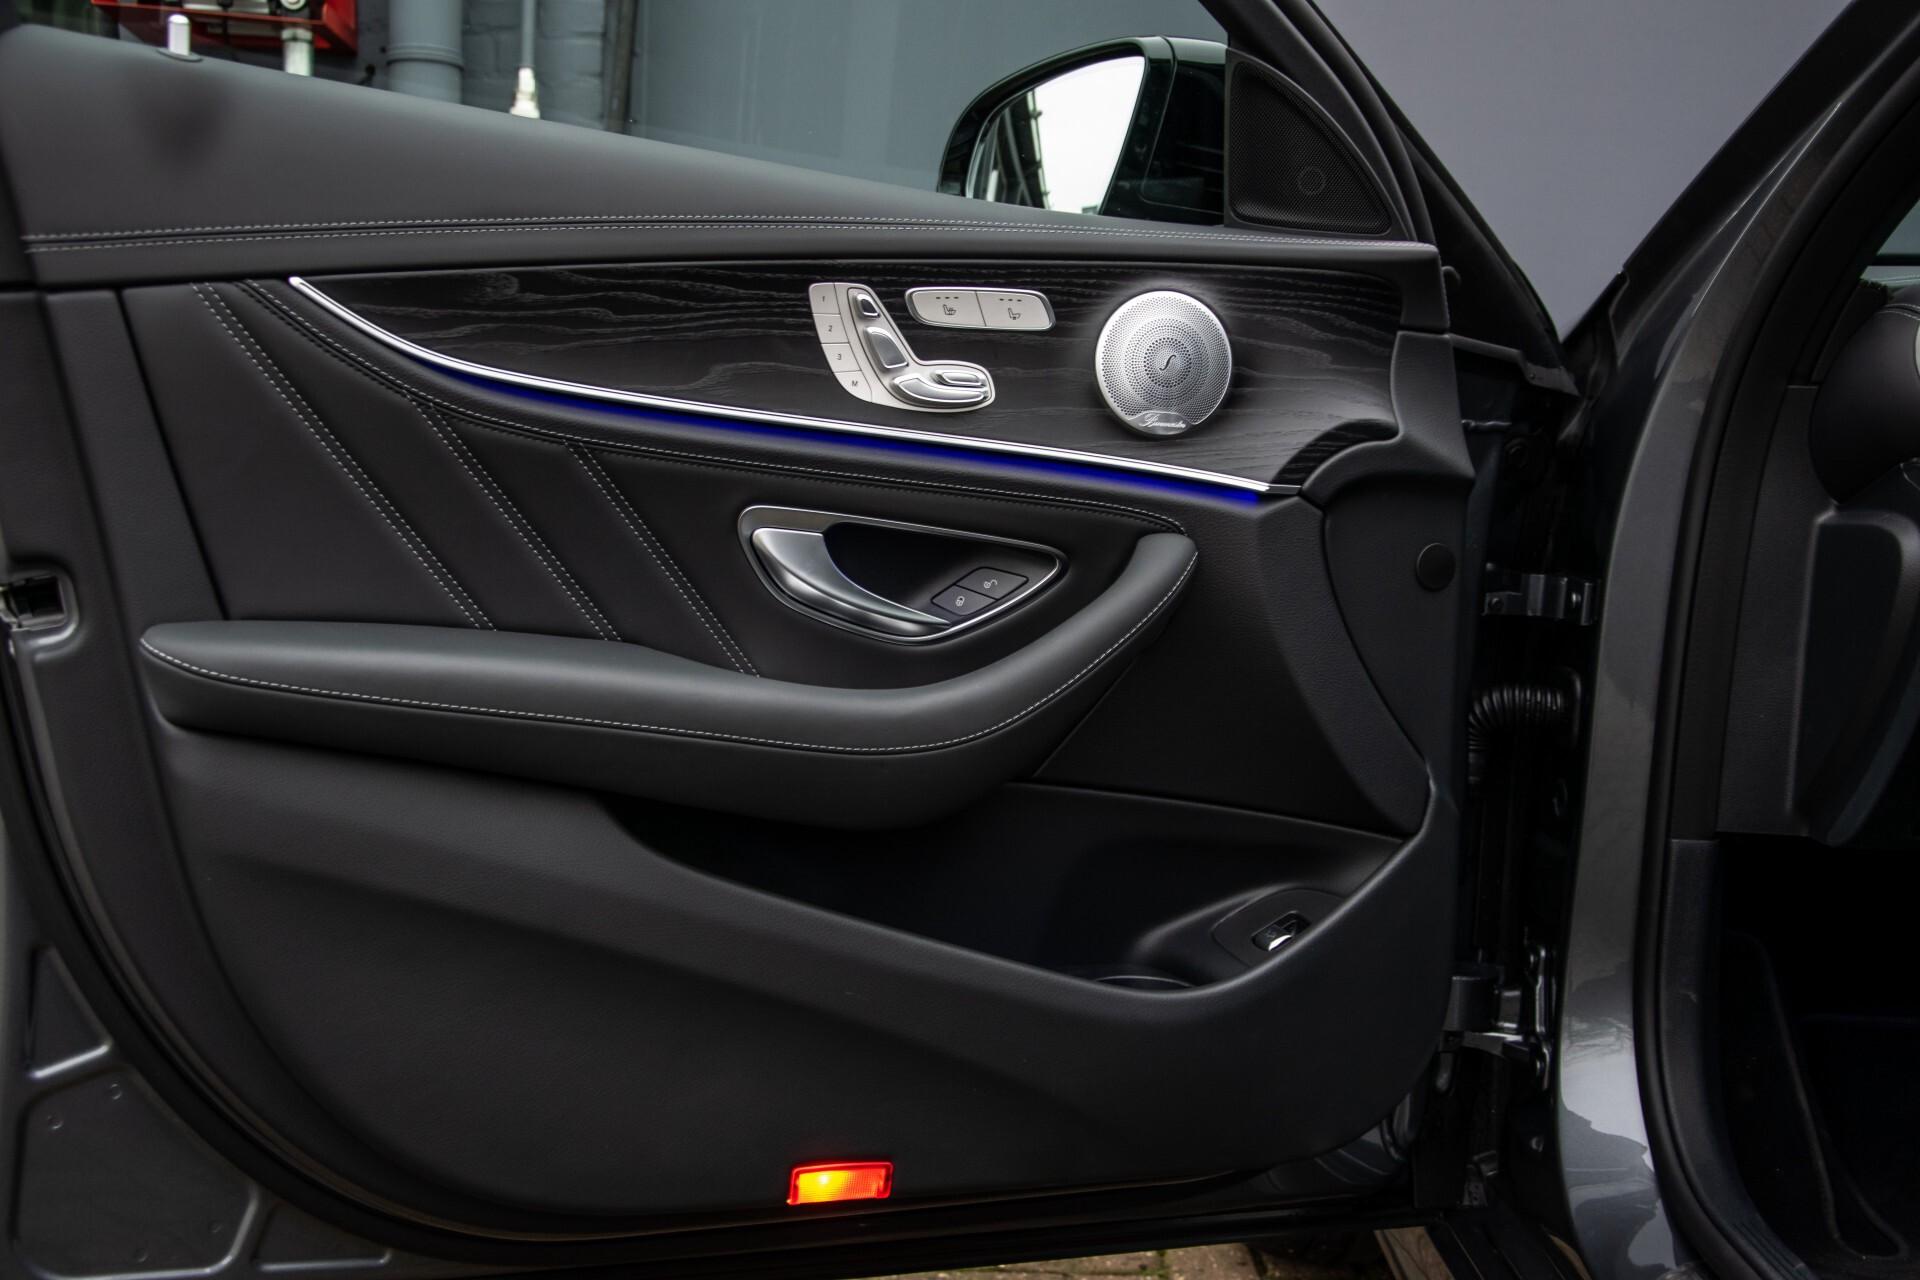 Mercedes-Benz E-Klasse 63 S AMG 4M+ NIEUW MODEL Night/Massage/Rij-assist/Keyless/Hud Aut9 Foto 32